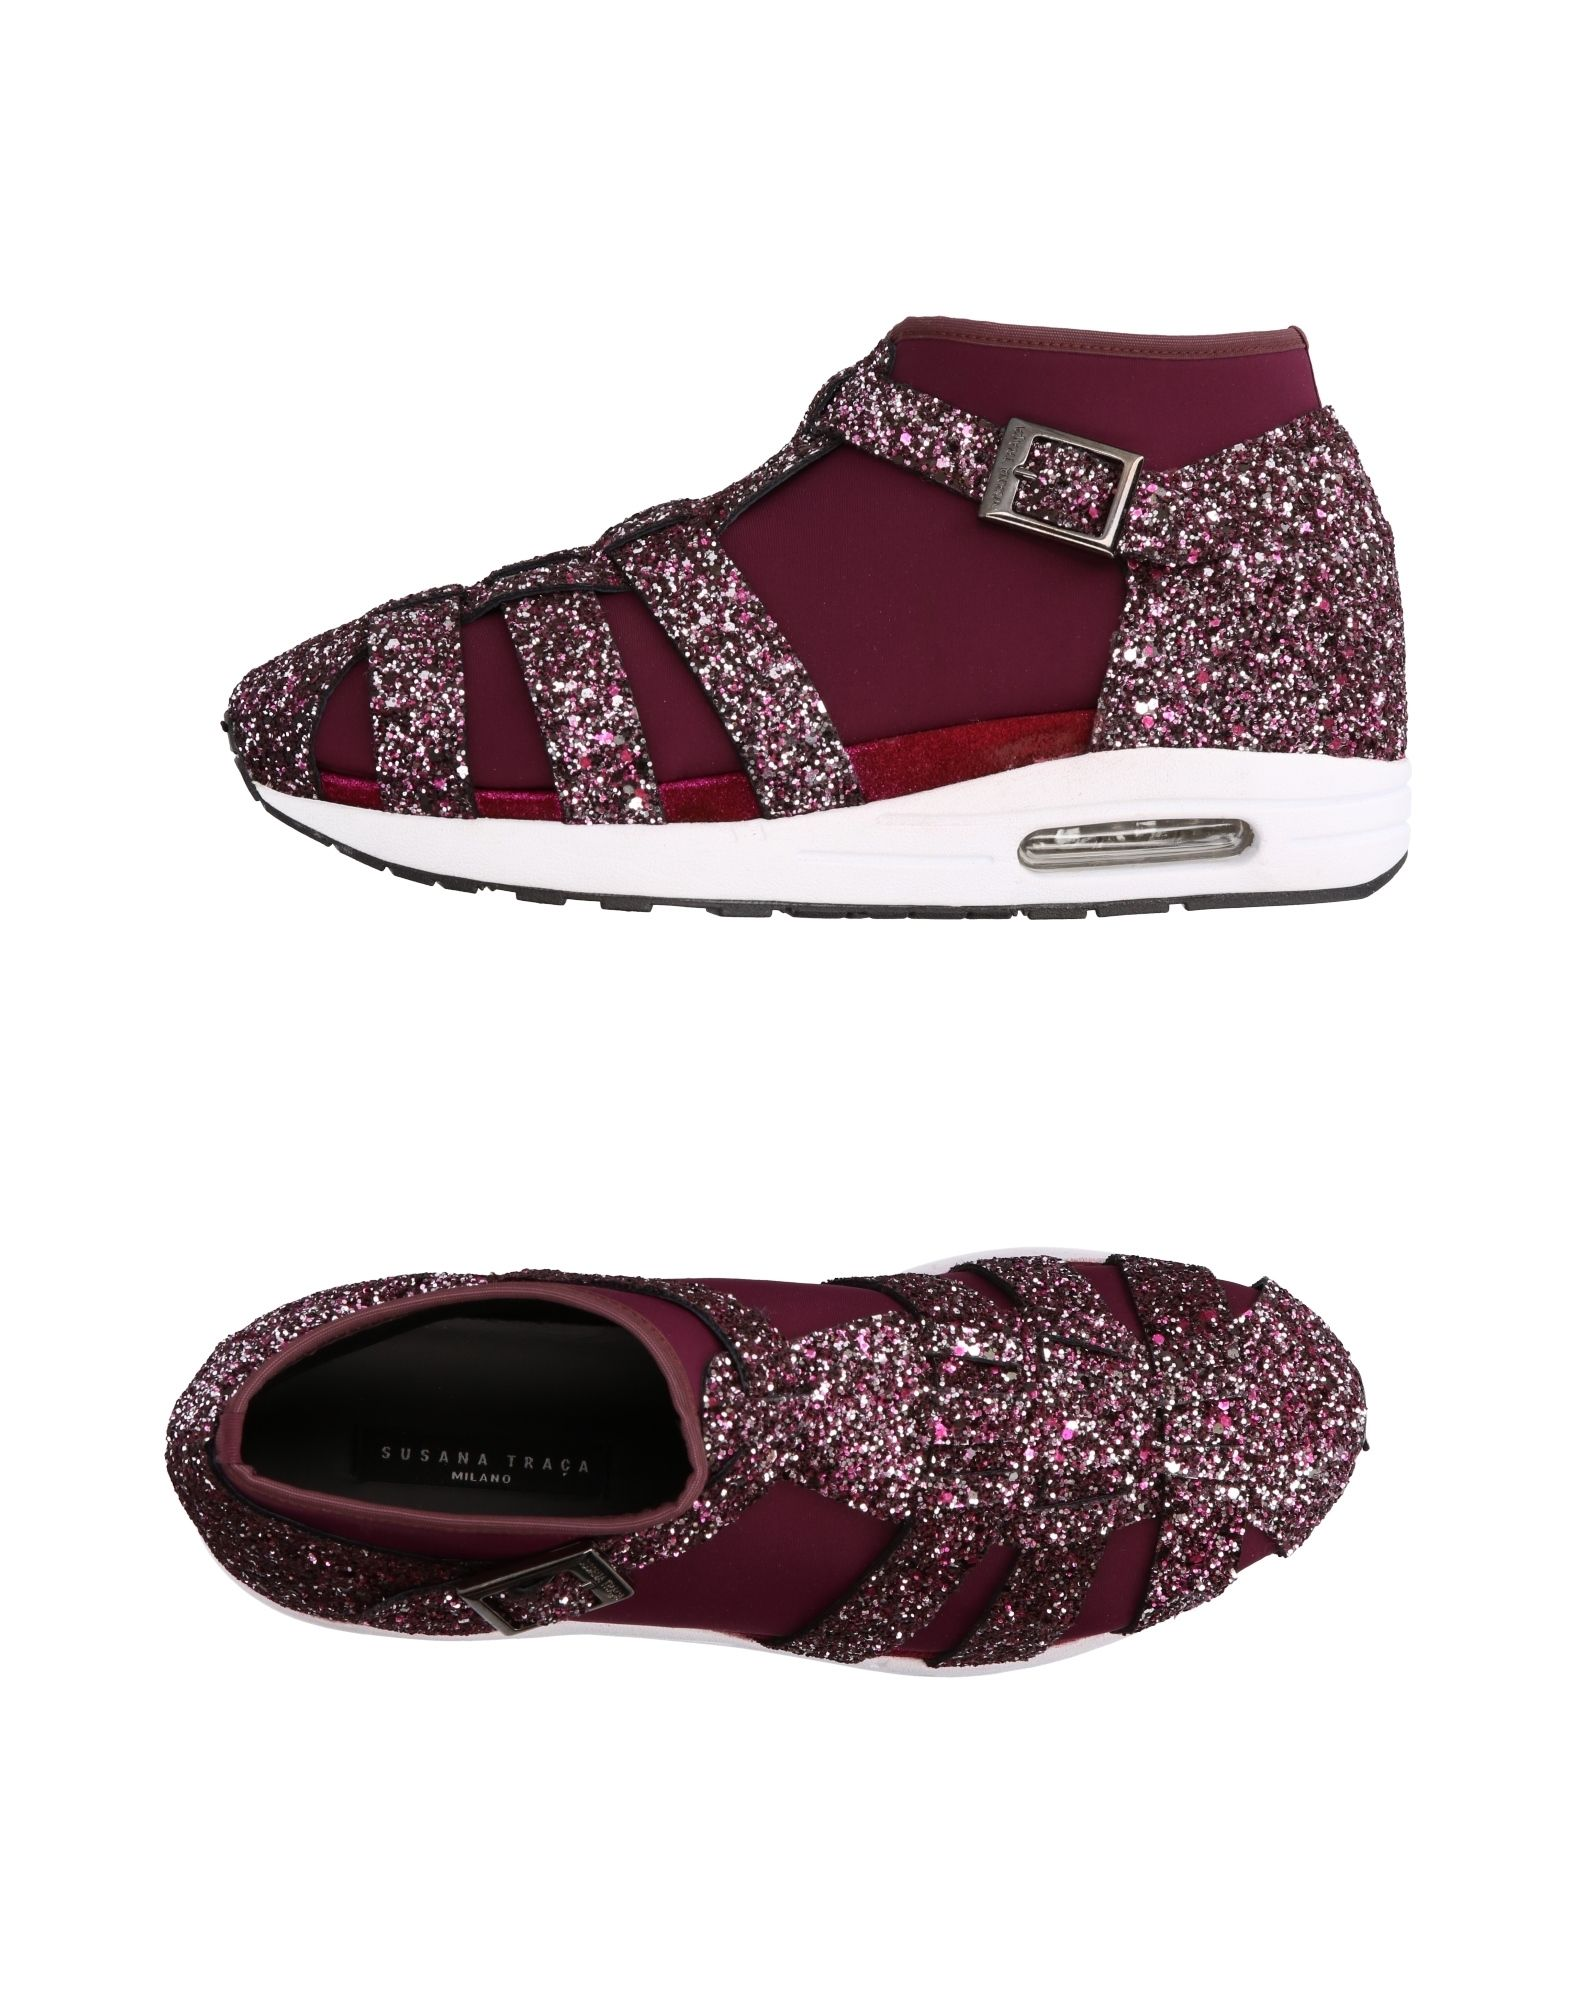 Susana Traca Sneakers Damen  11239163HQ Gute Qualität beliebte Schuhe